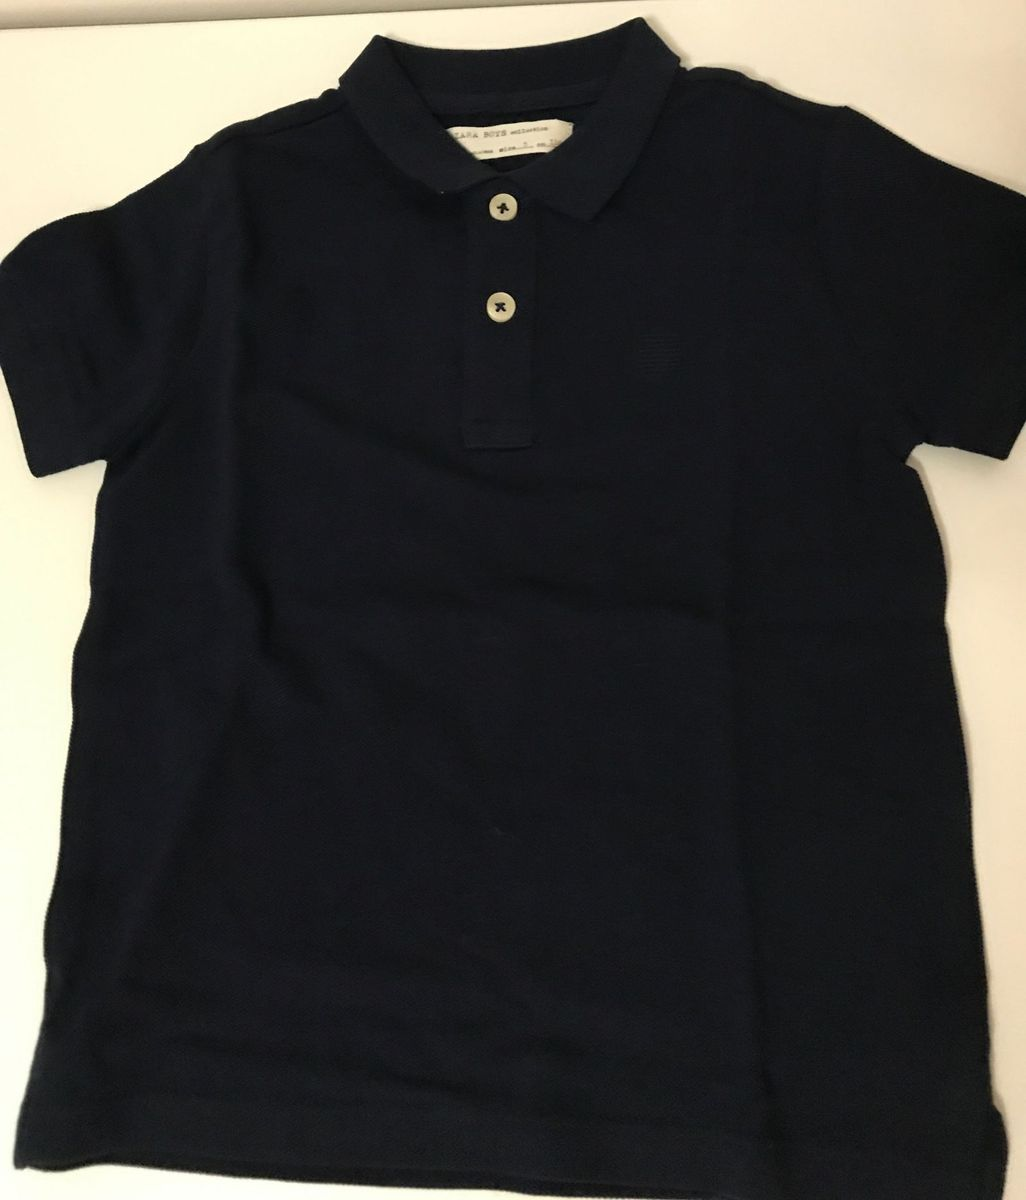 camisa tradicional polo manga curta infantil zara kids menino azul escuro 5  anos - menino zara 1d741a53cf